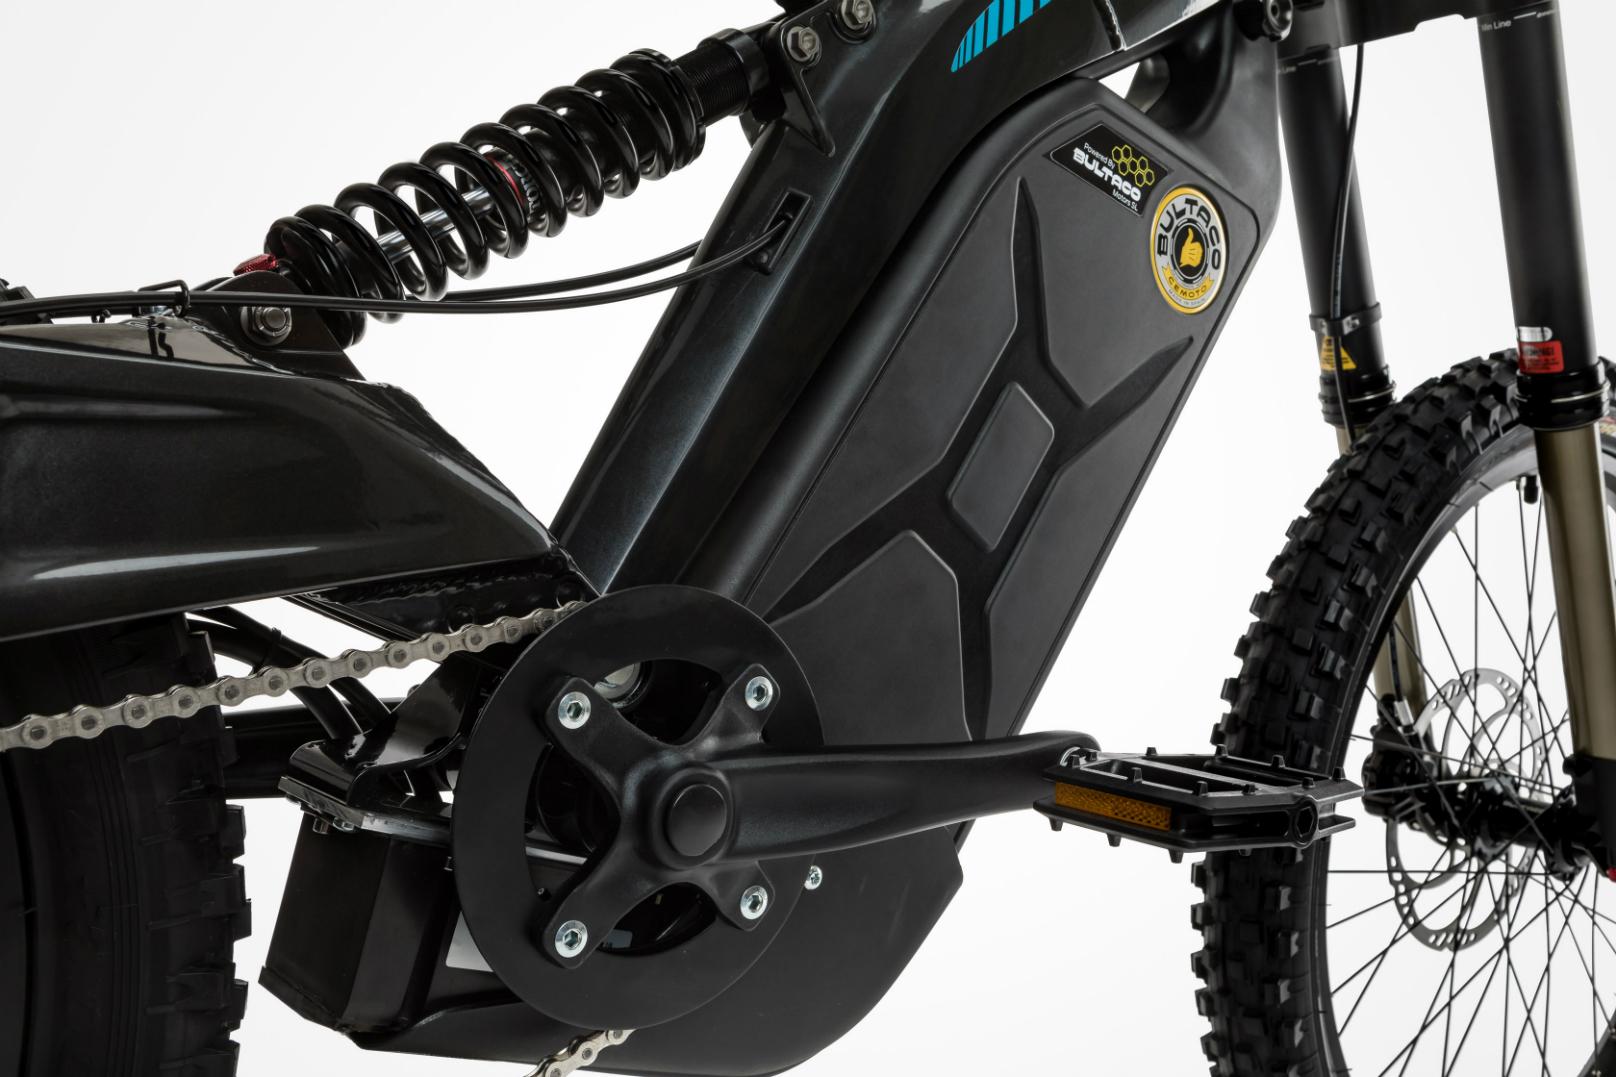 Brinco R-B Electric Bicycle